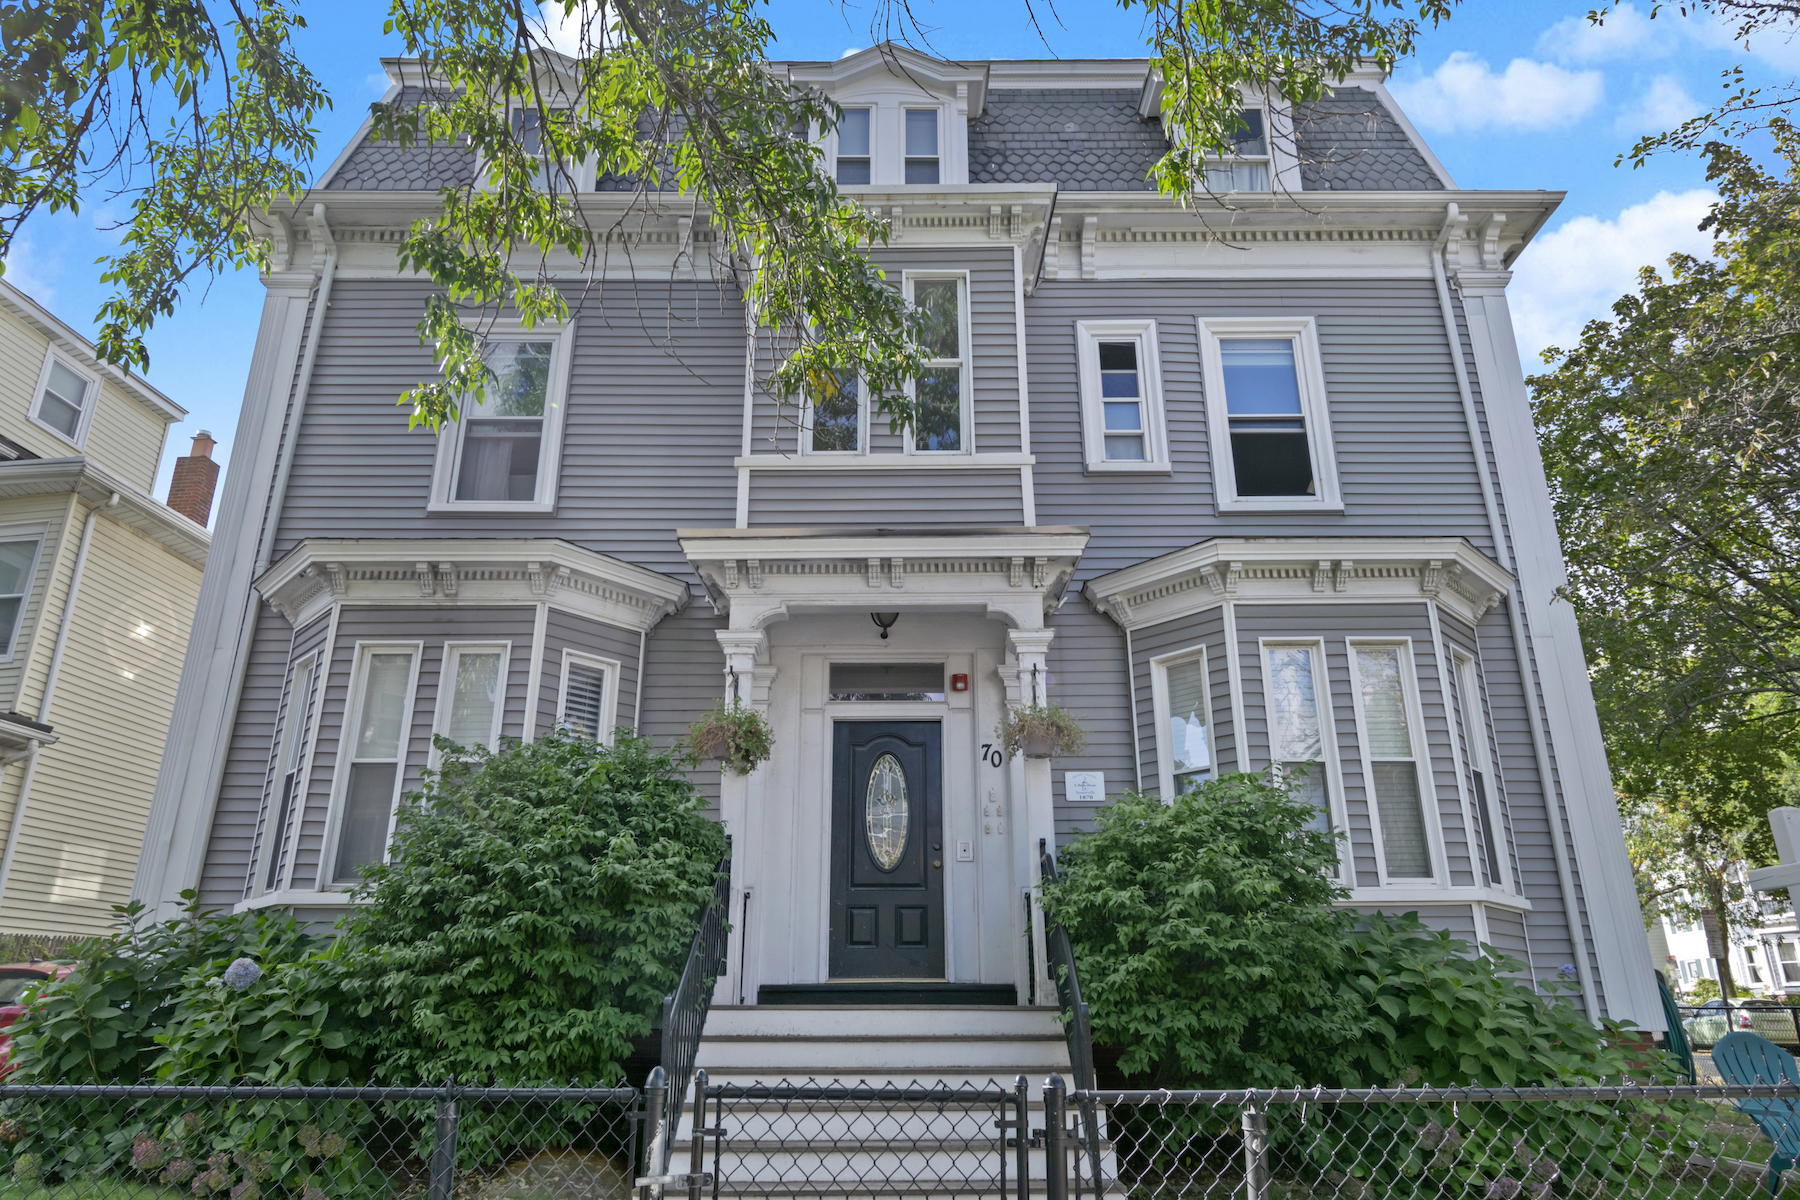 Condominiums 为 销售 在 70 Pearl Street, Unit 1 70 Pearl St 1 Somerville, 马萨诸塞州 02145 美国